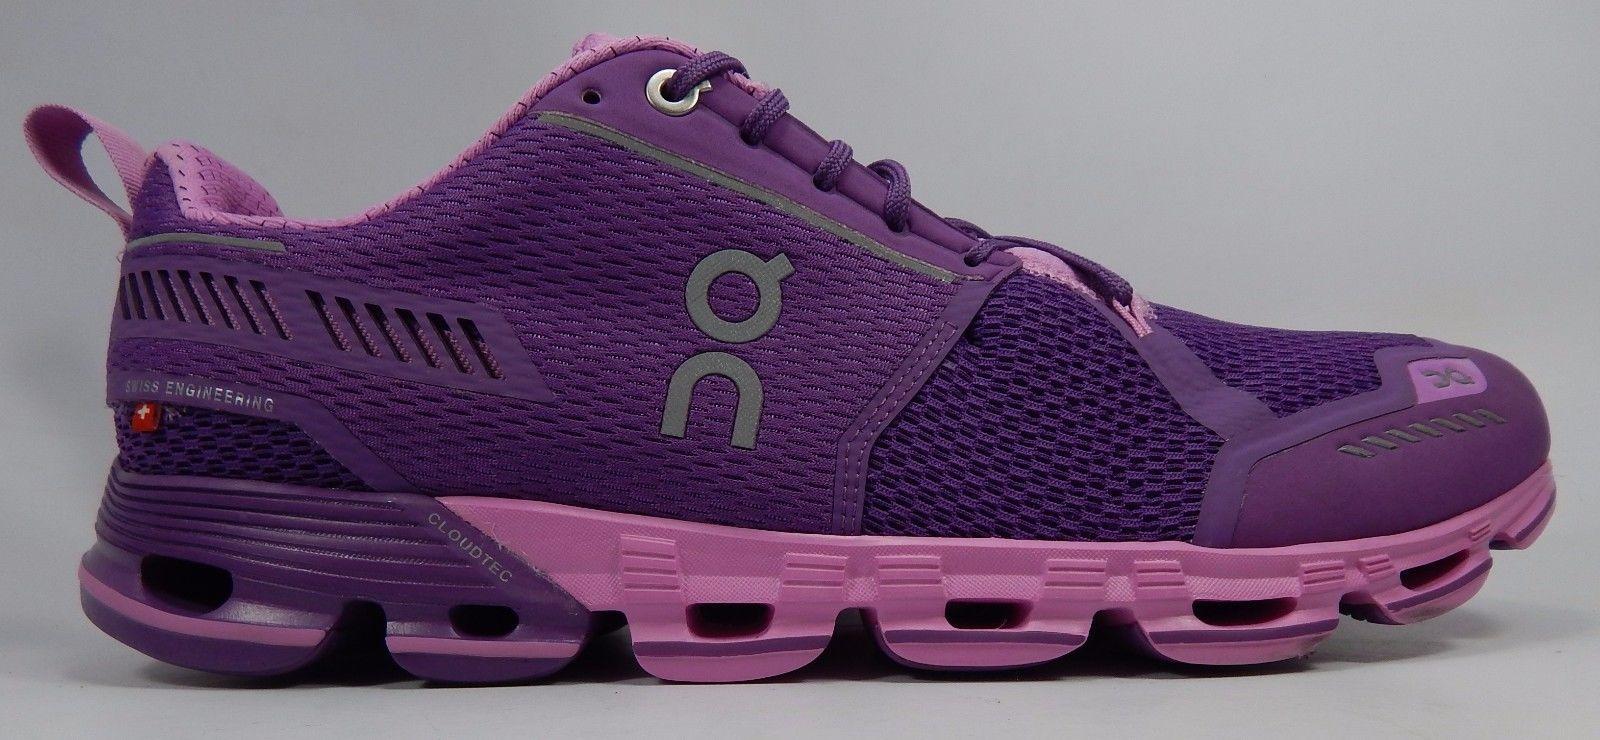 ON Running Cloudflyer Women's Running Shoes Size US 11 M (B) EU 43 Purple Pink